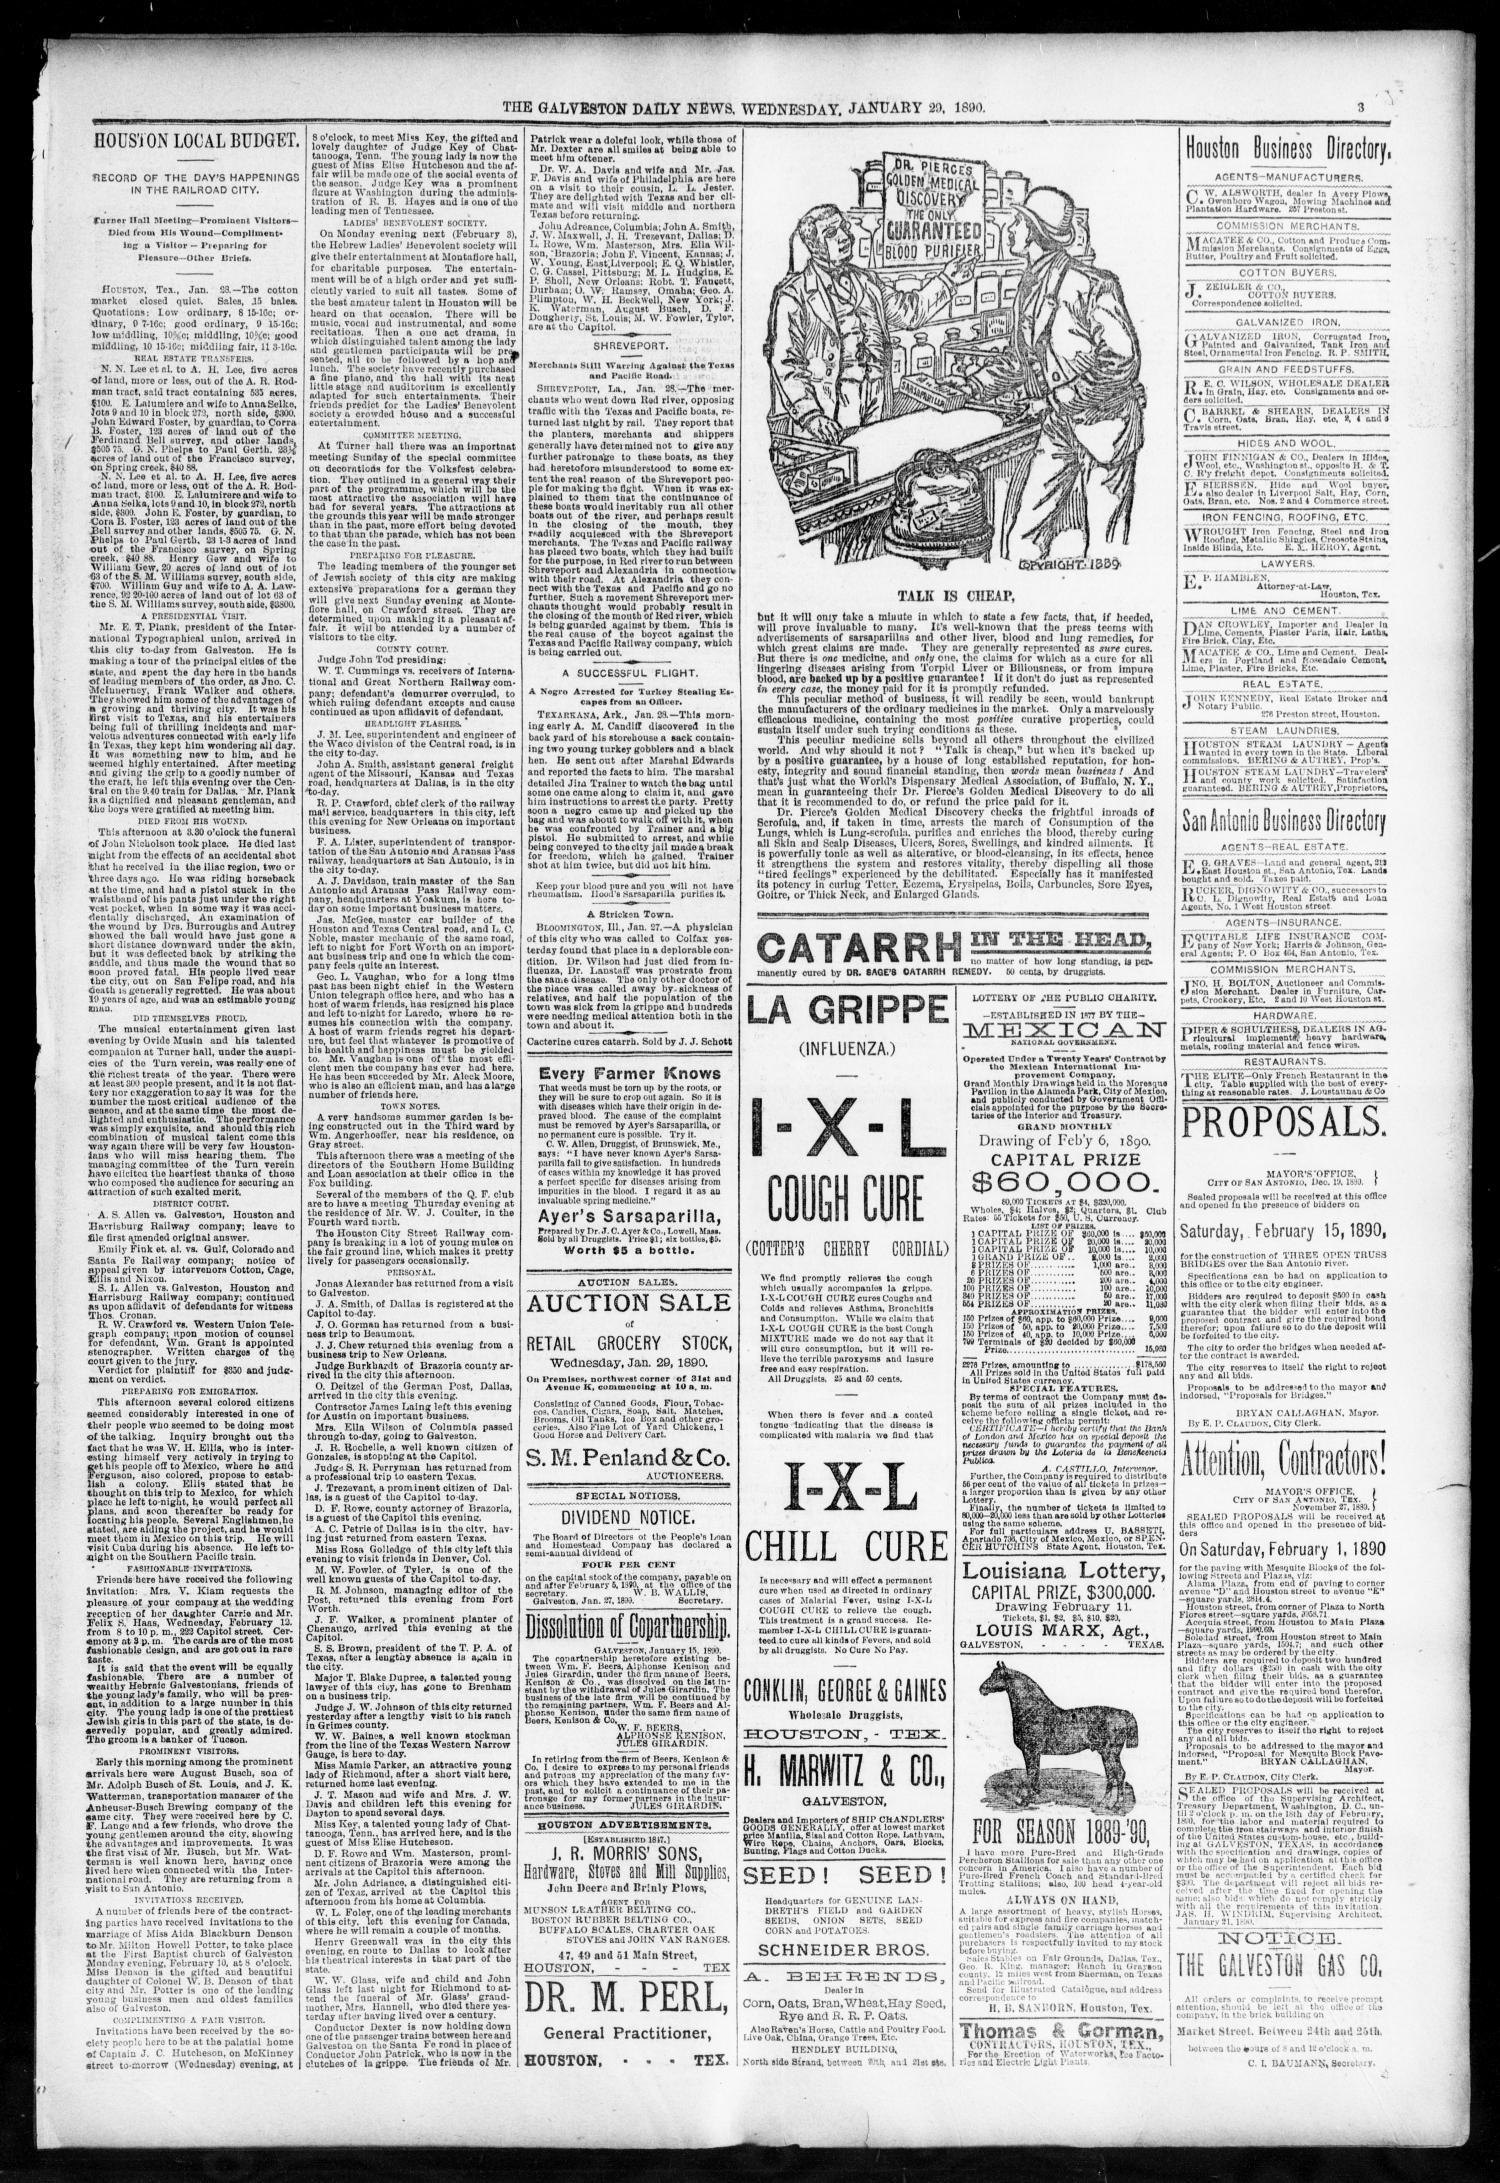 The Galveston Daily News. (Galveston, Tex.), Vol. 48, No. 277, Ed. 1 ...